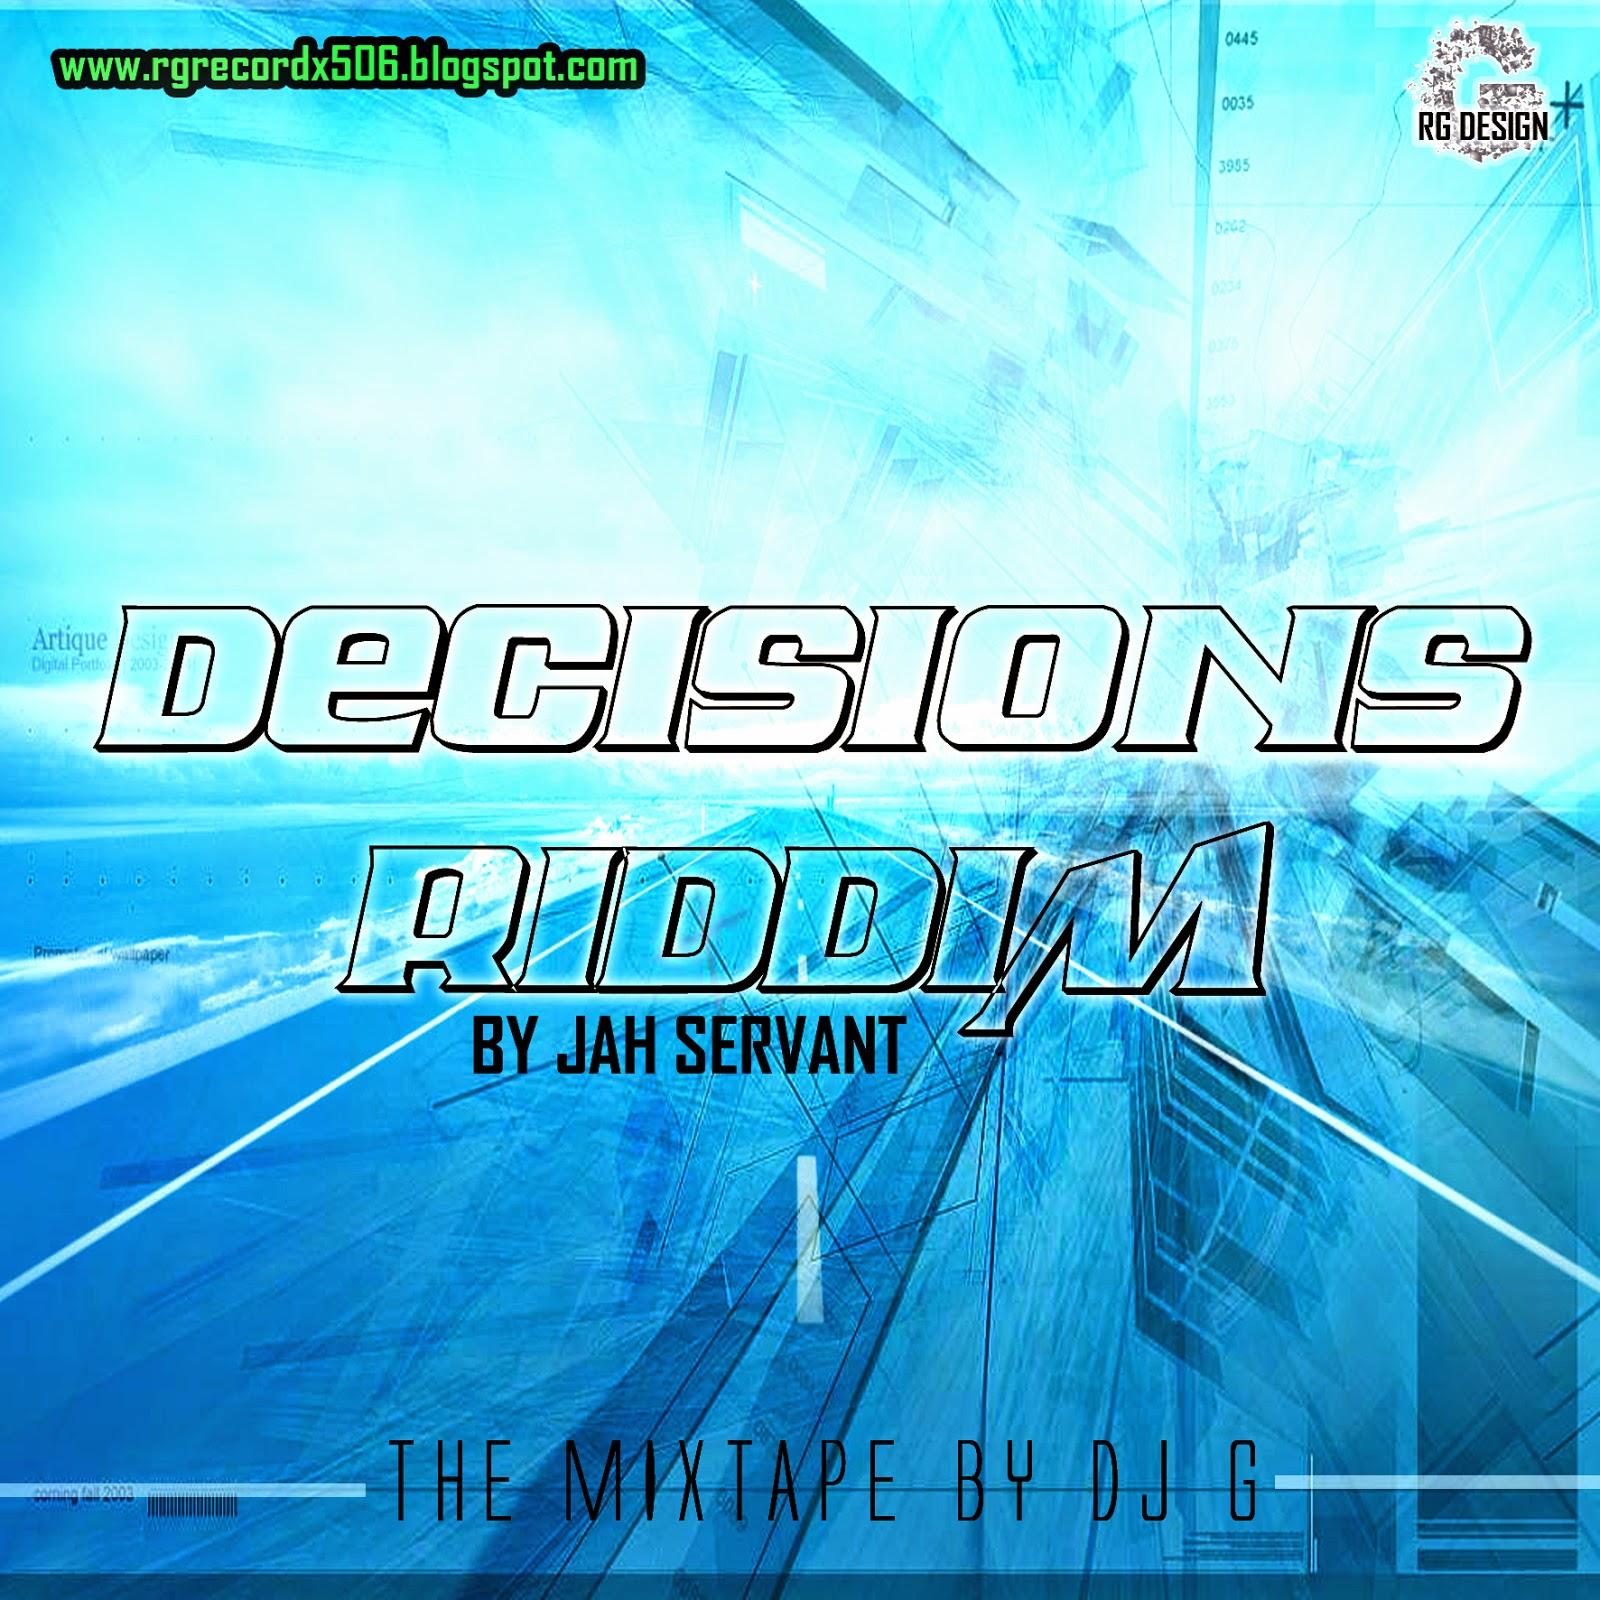 http://www.mediafire.com/listen/nhhcrv4673cz879/DECISIONS_RIDDIM_-_DJ_G_(mixtape).mp3